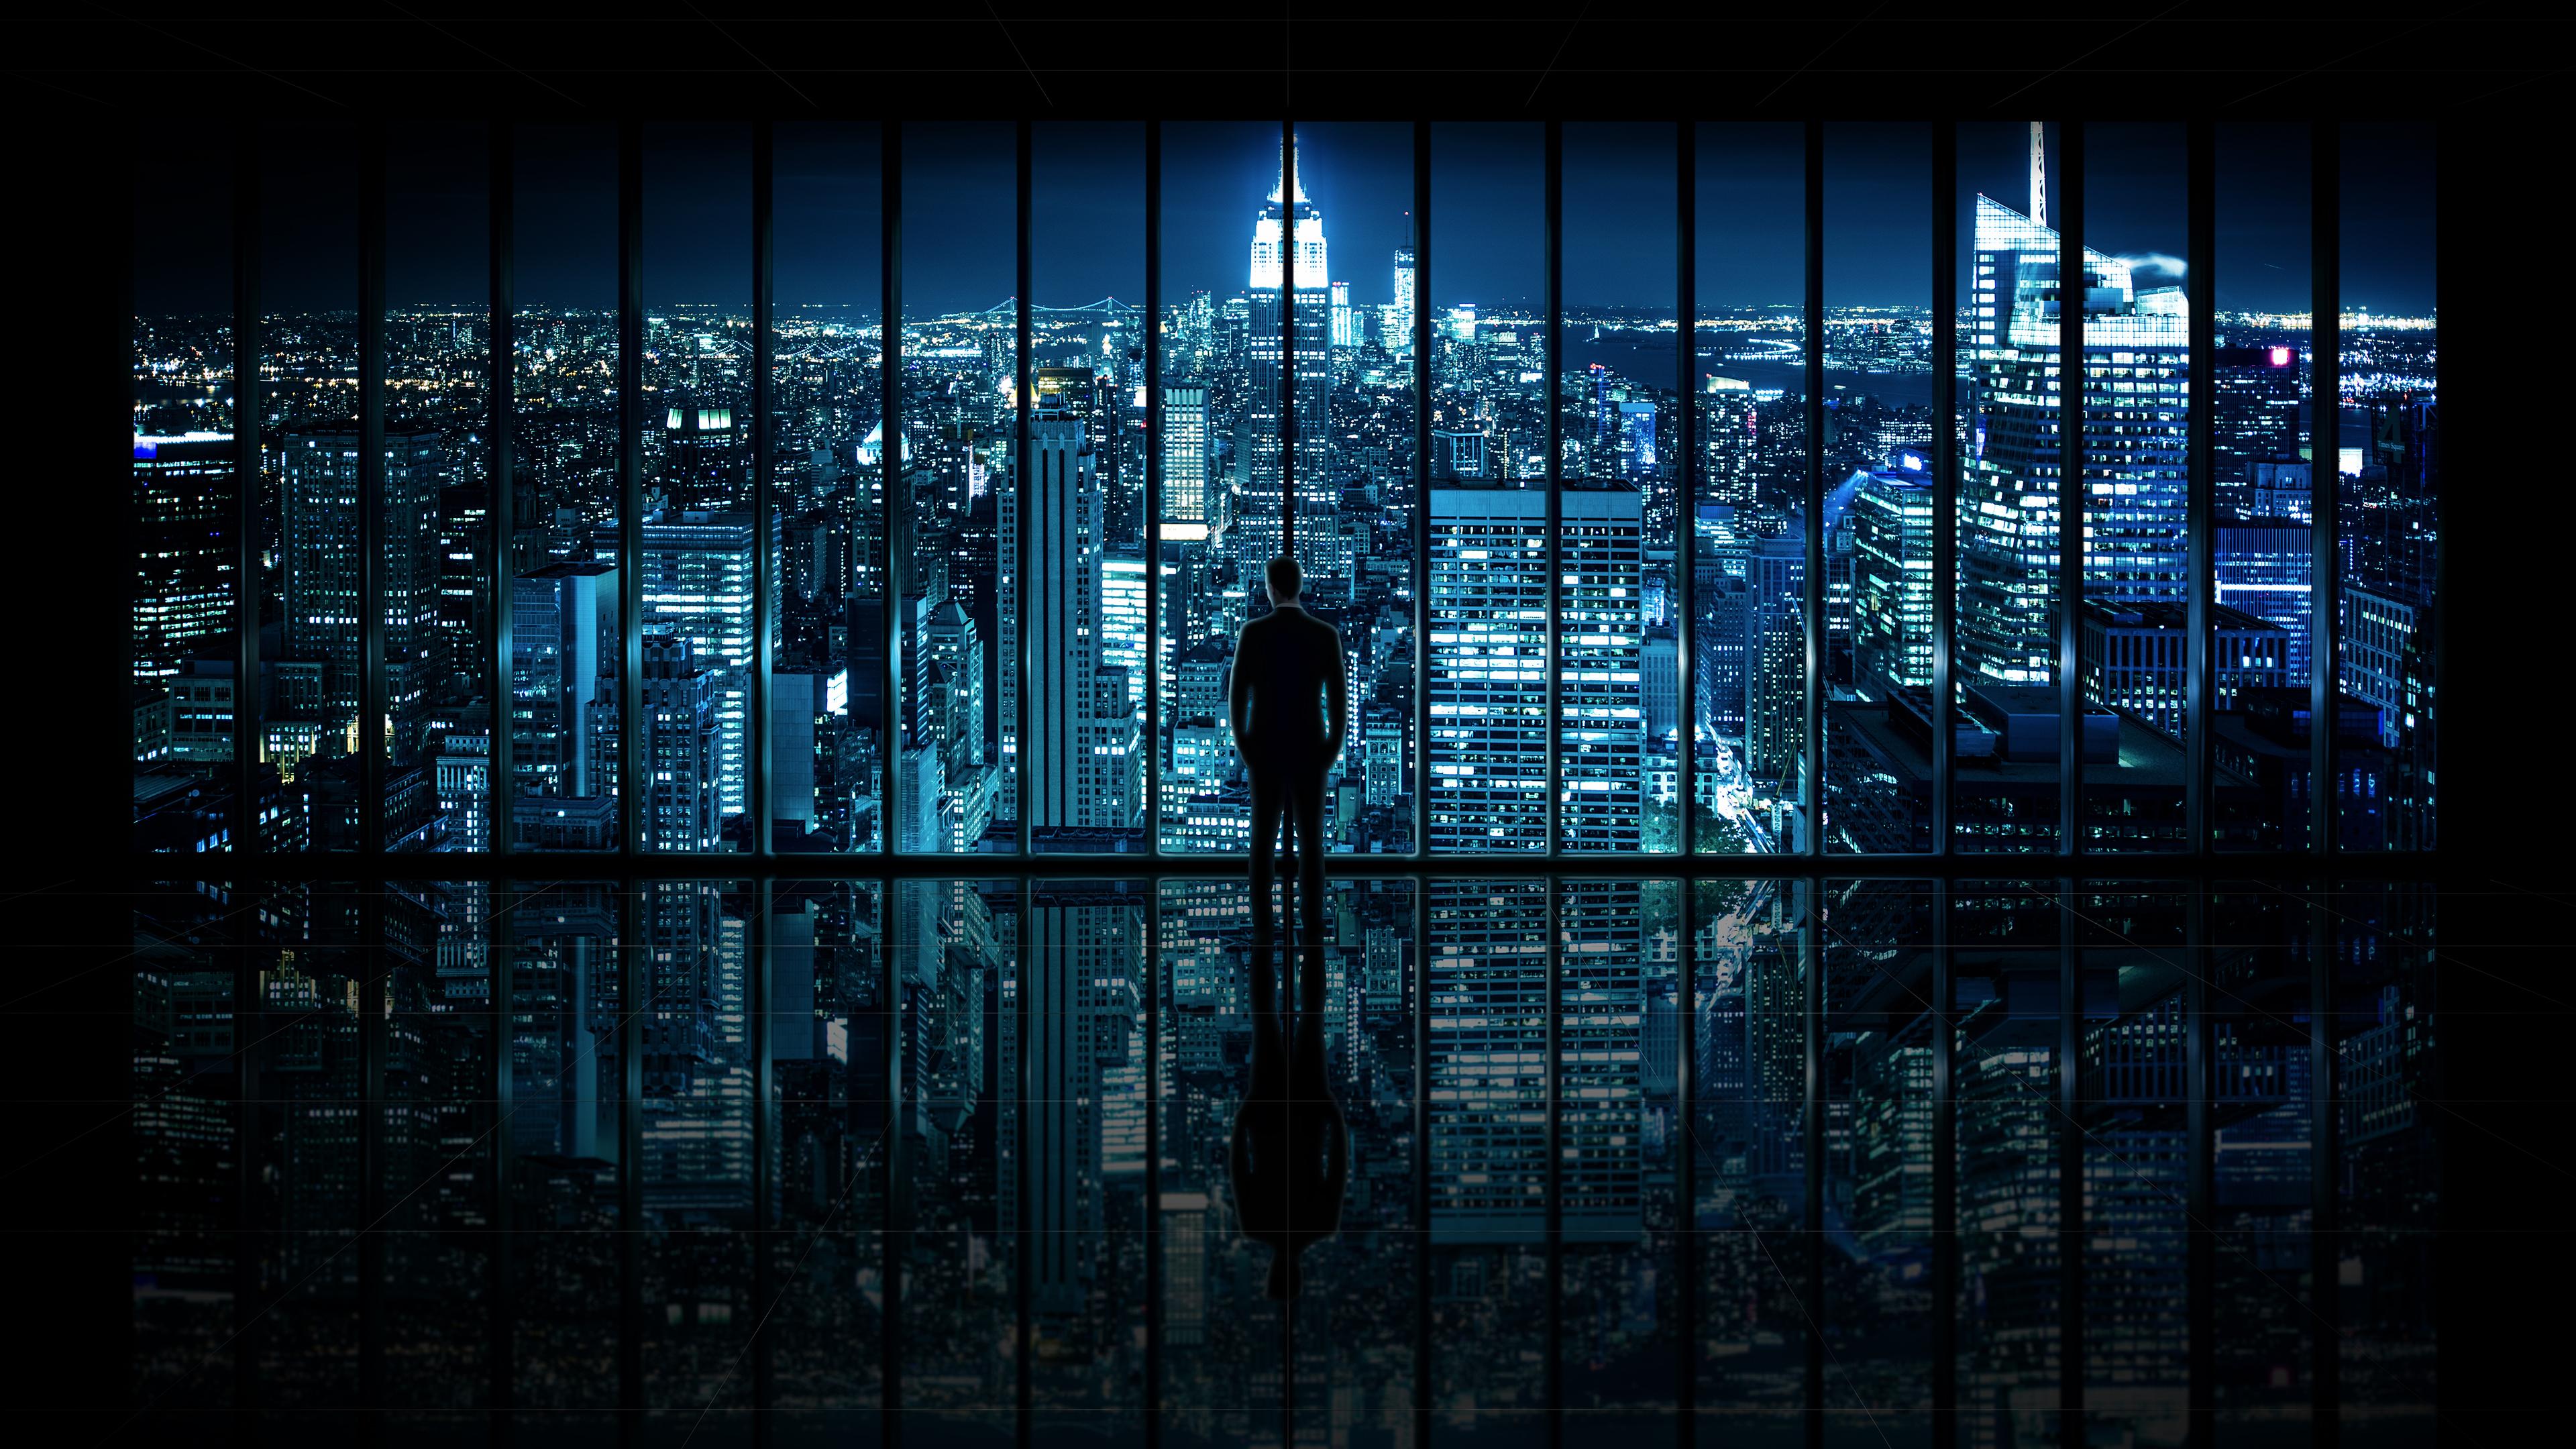 Windows 10 Gotham City 4K Wallpaper 4K Wallpaper   Ultra HD 4K 3840x2160